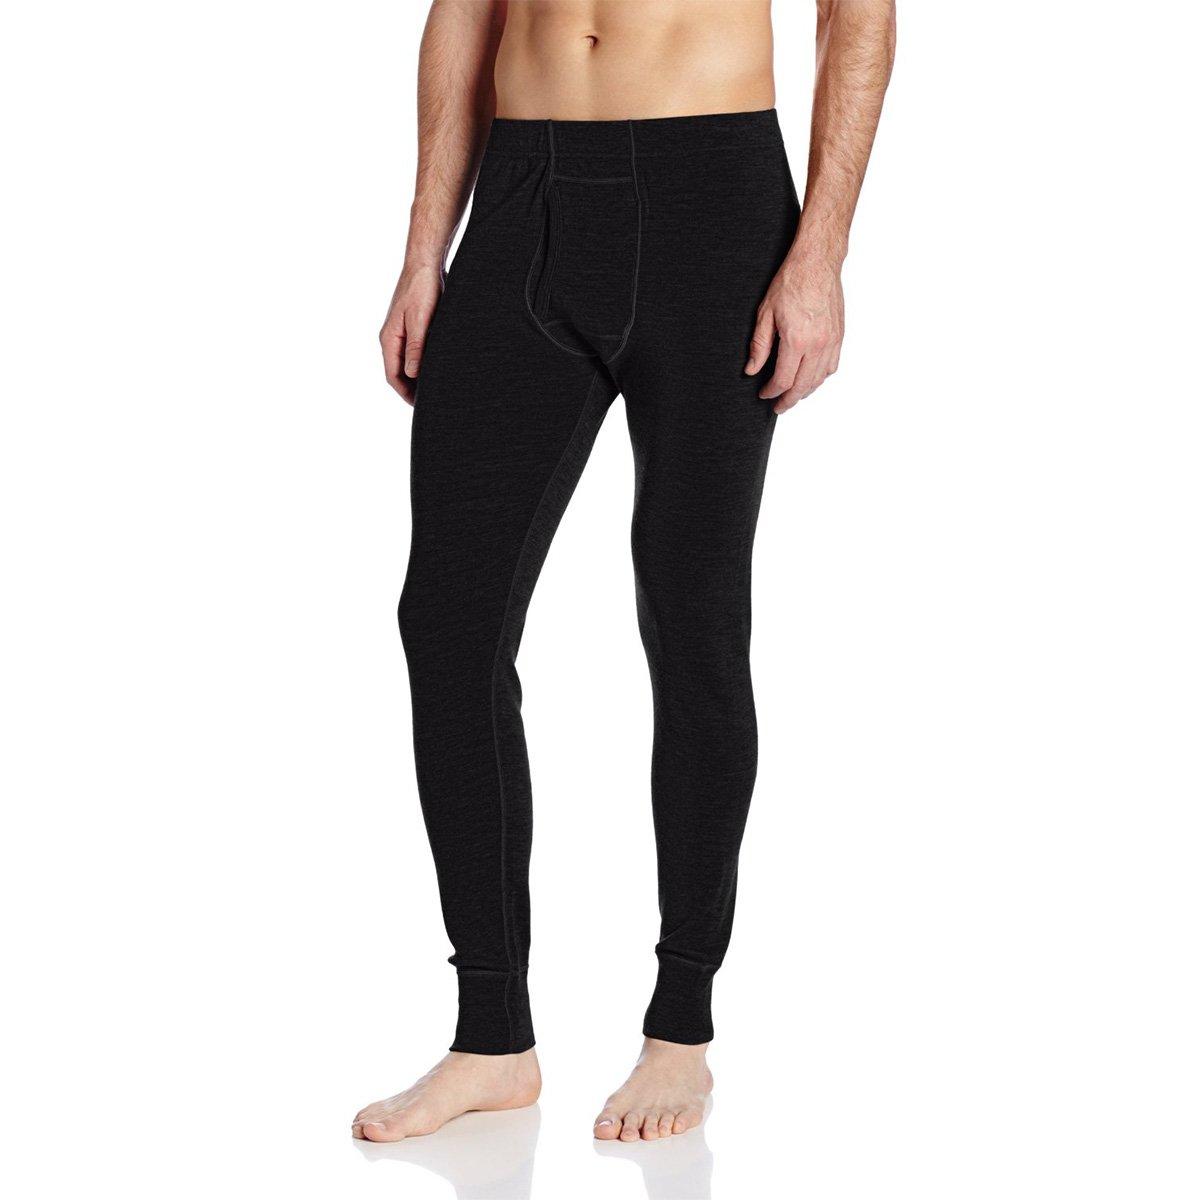 Minus33 Merino Wool Men's Kancamagus Midweight Bottom, Black, Medium-Tall